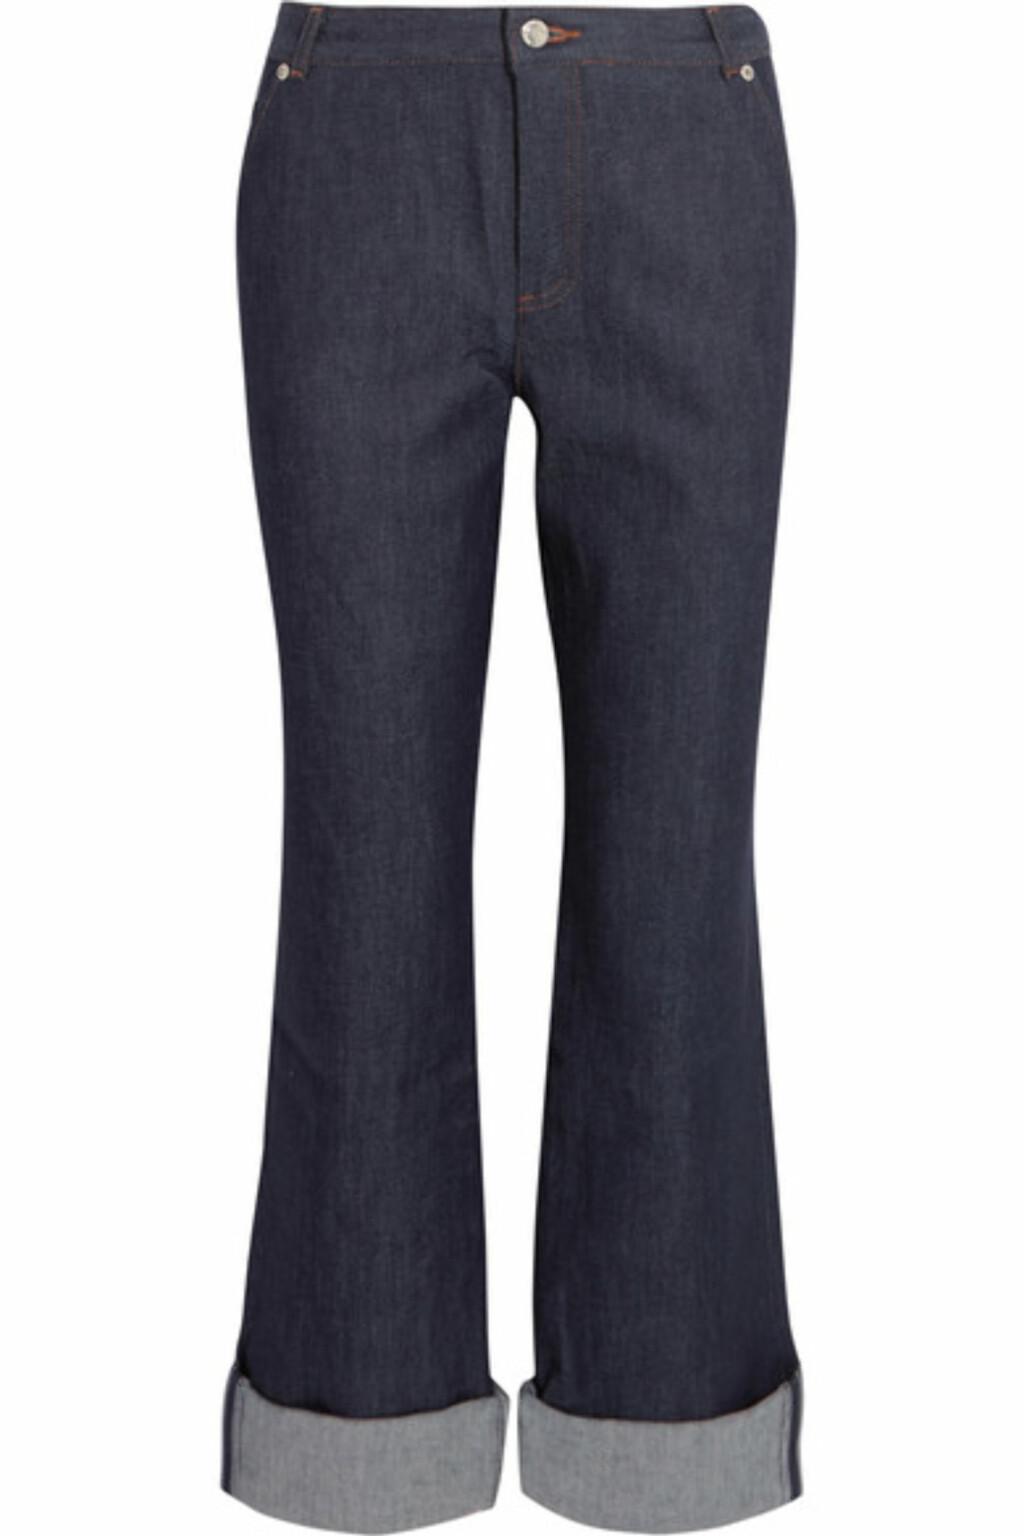 5c3266aa Jeans fra vanessa Seward via Net-a-porter.com | kr 2146